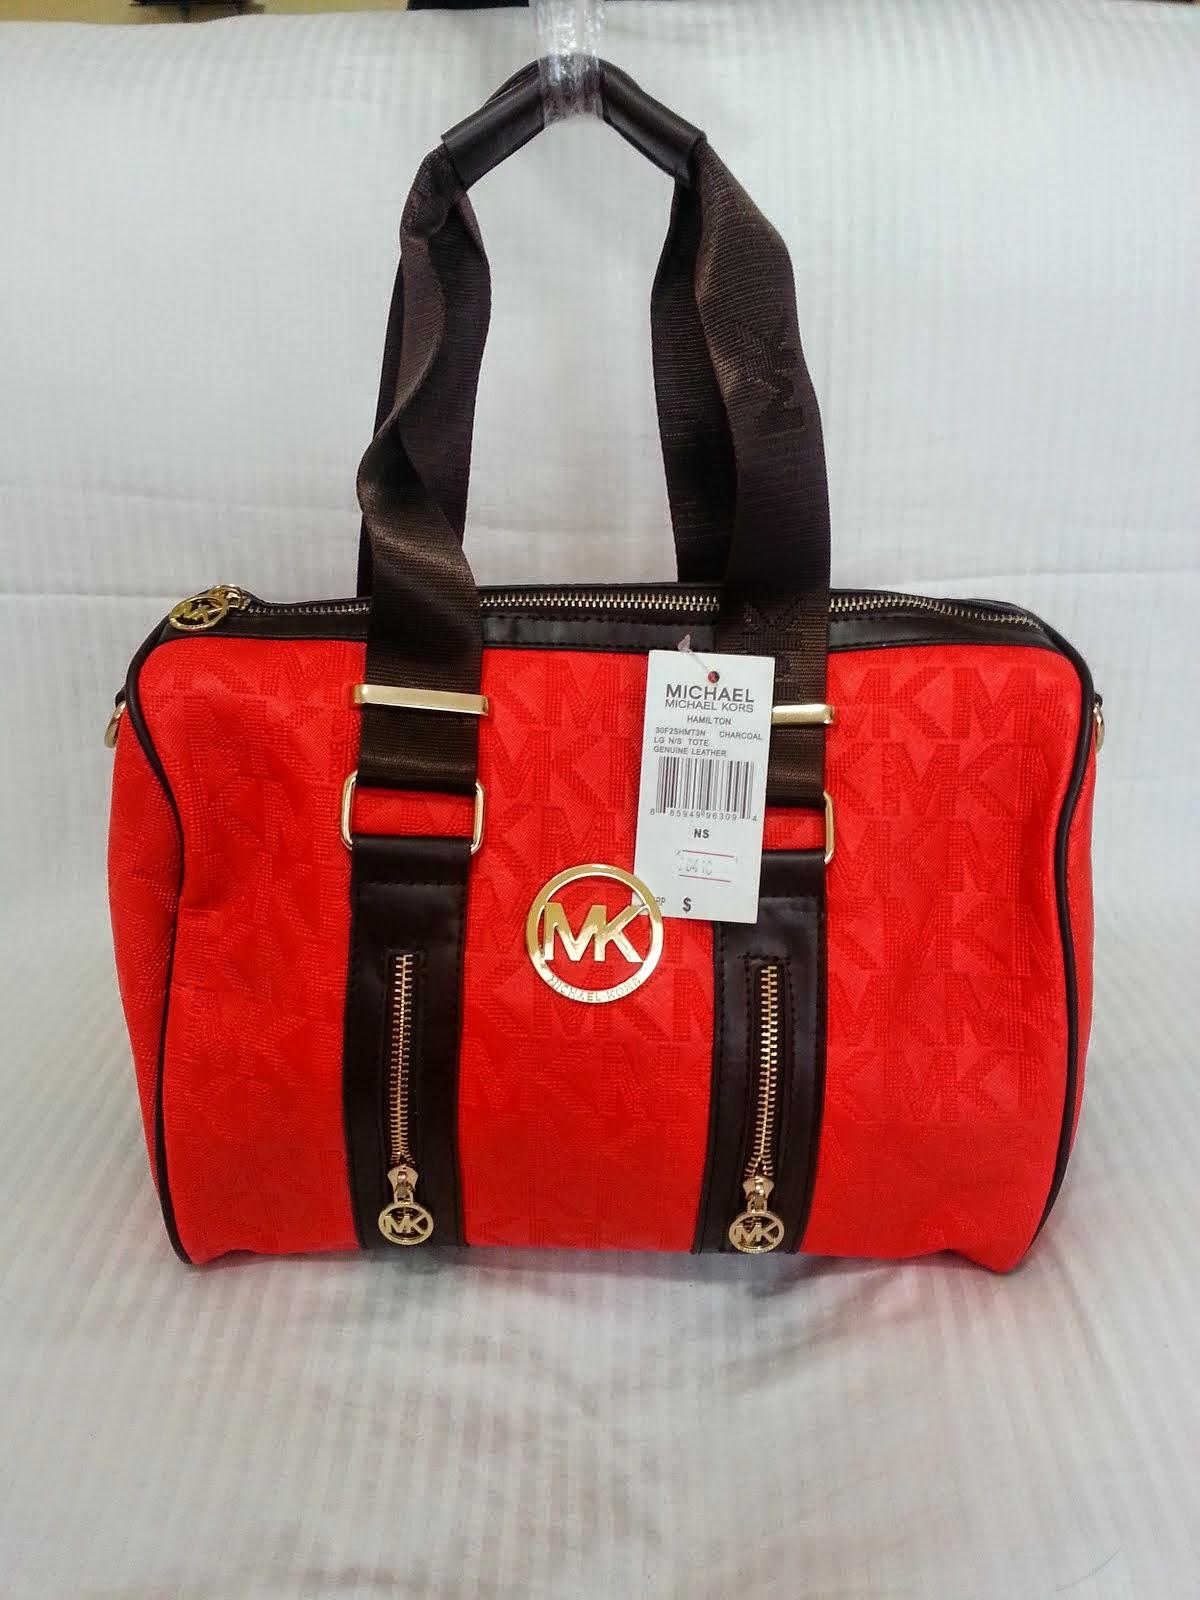 CARTERA MK ROJO (red) 20413